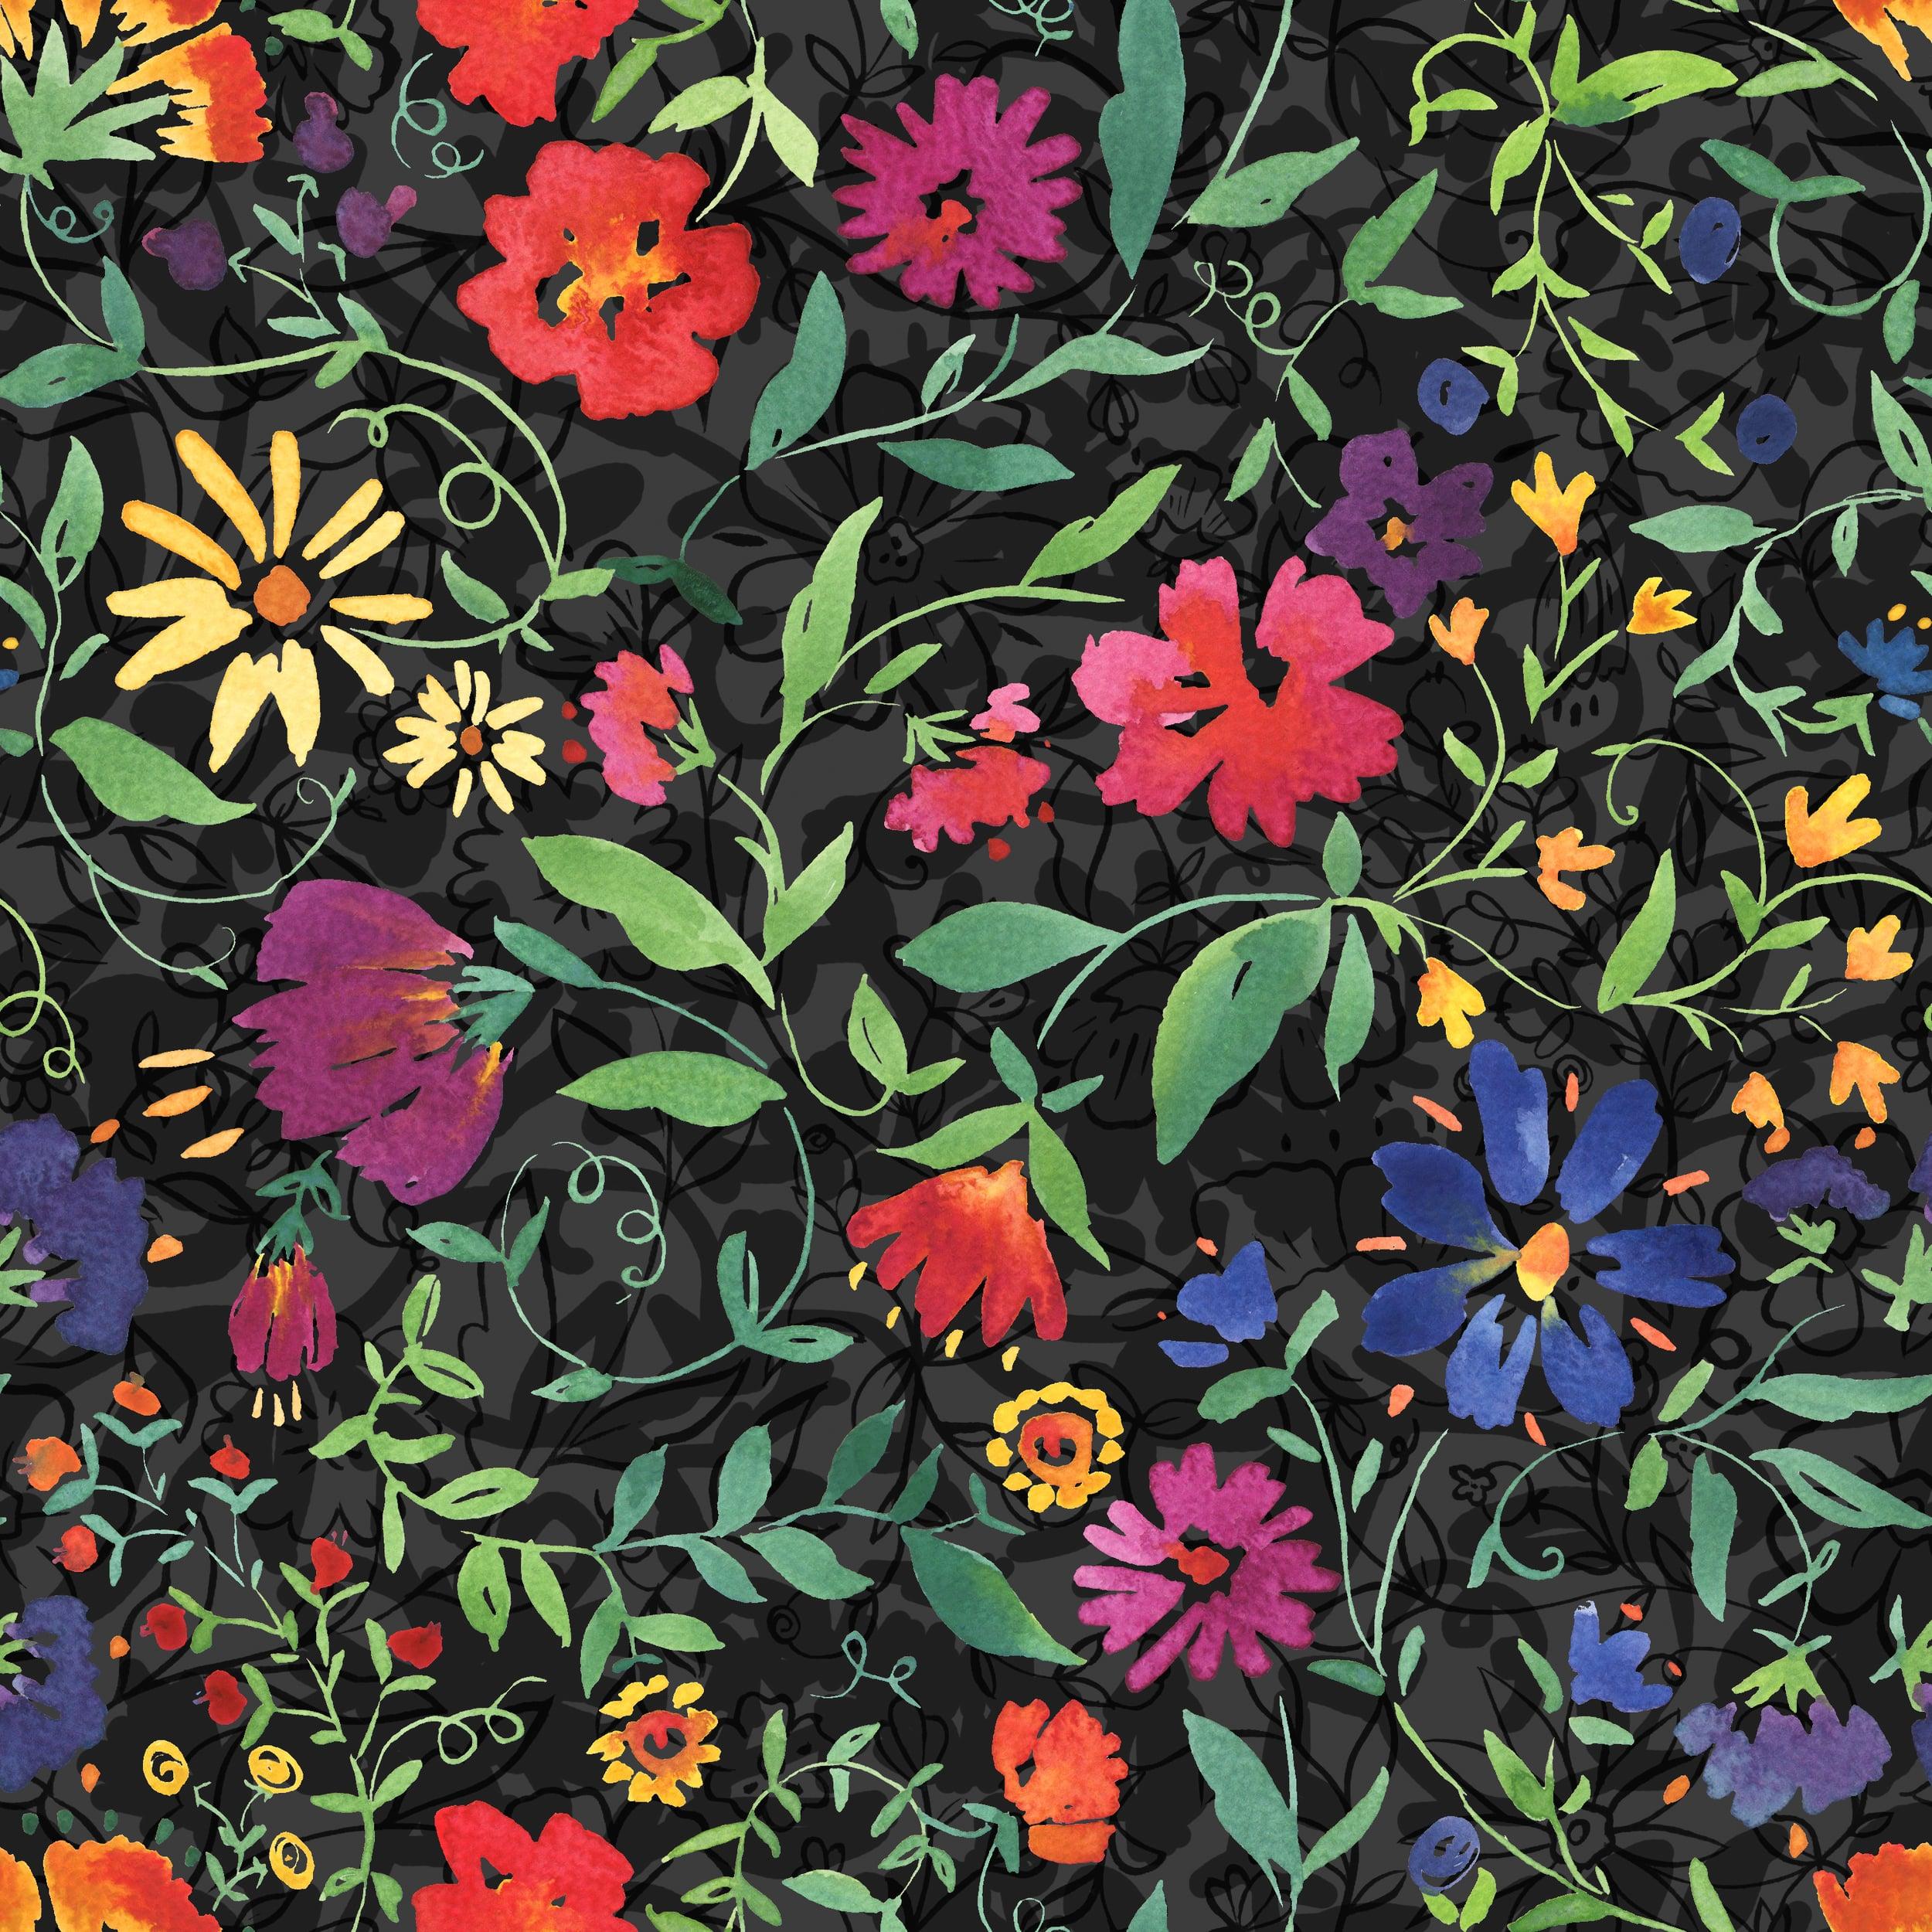 floral toss sketch repeat-Color3-Dark.jpg